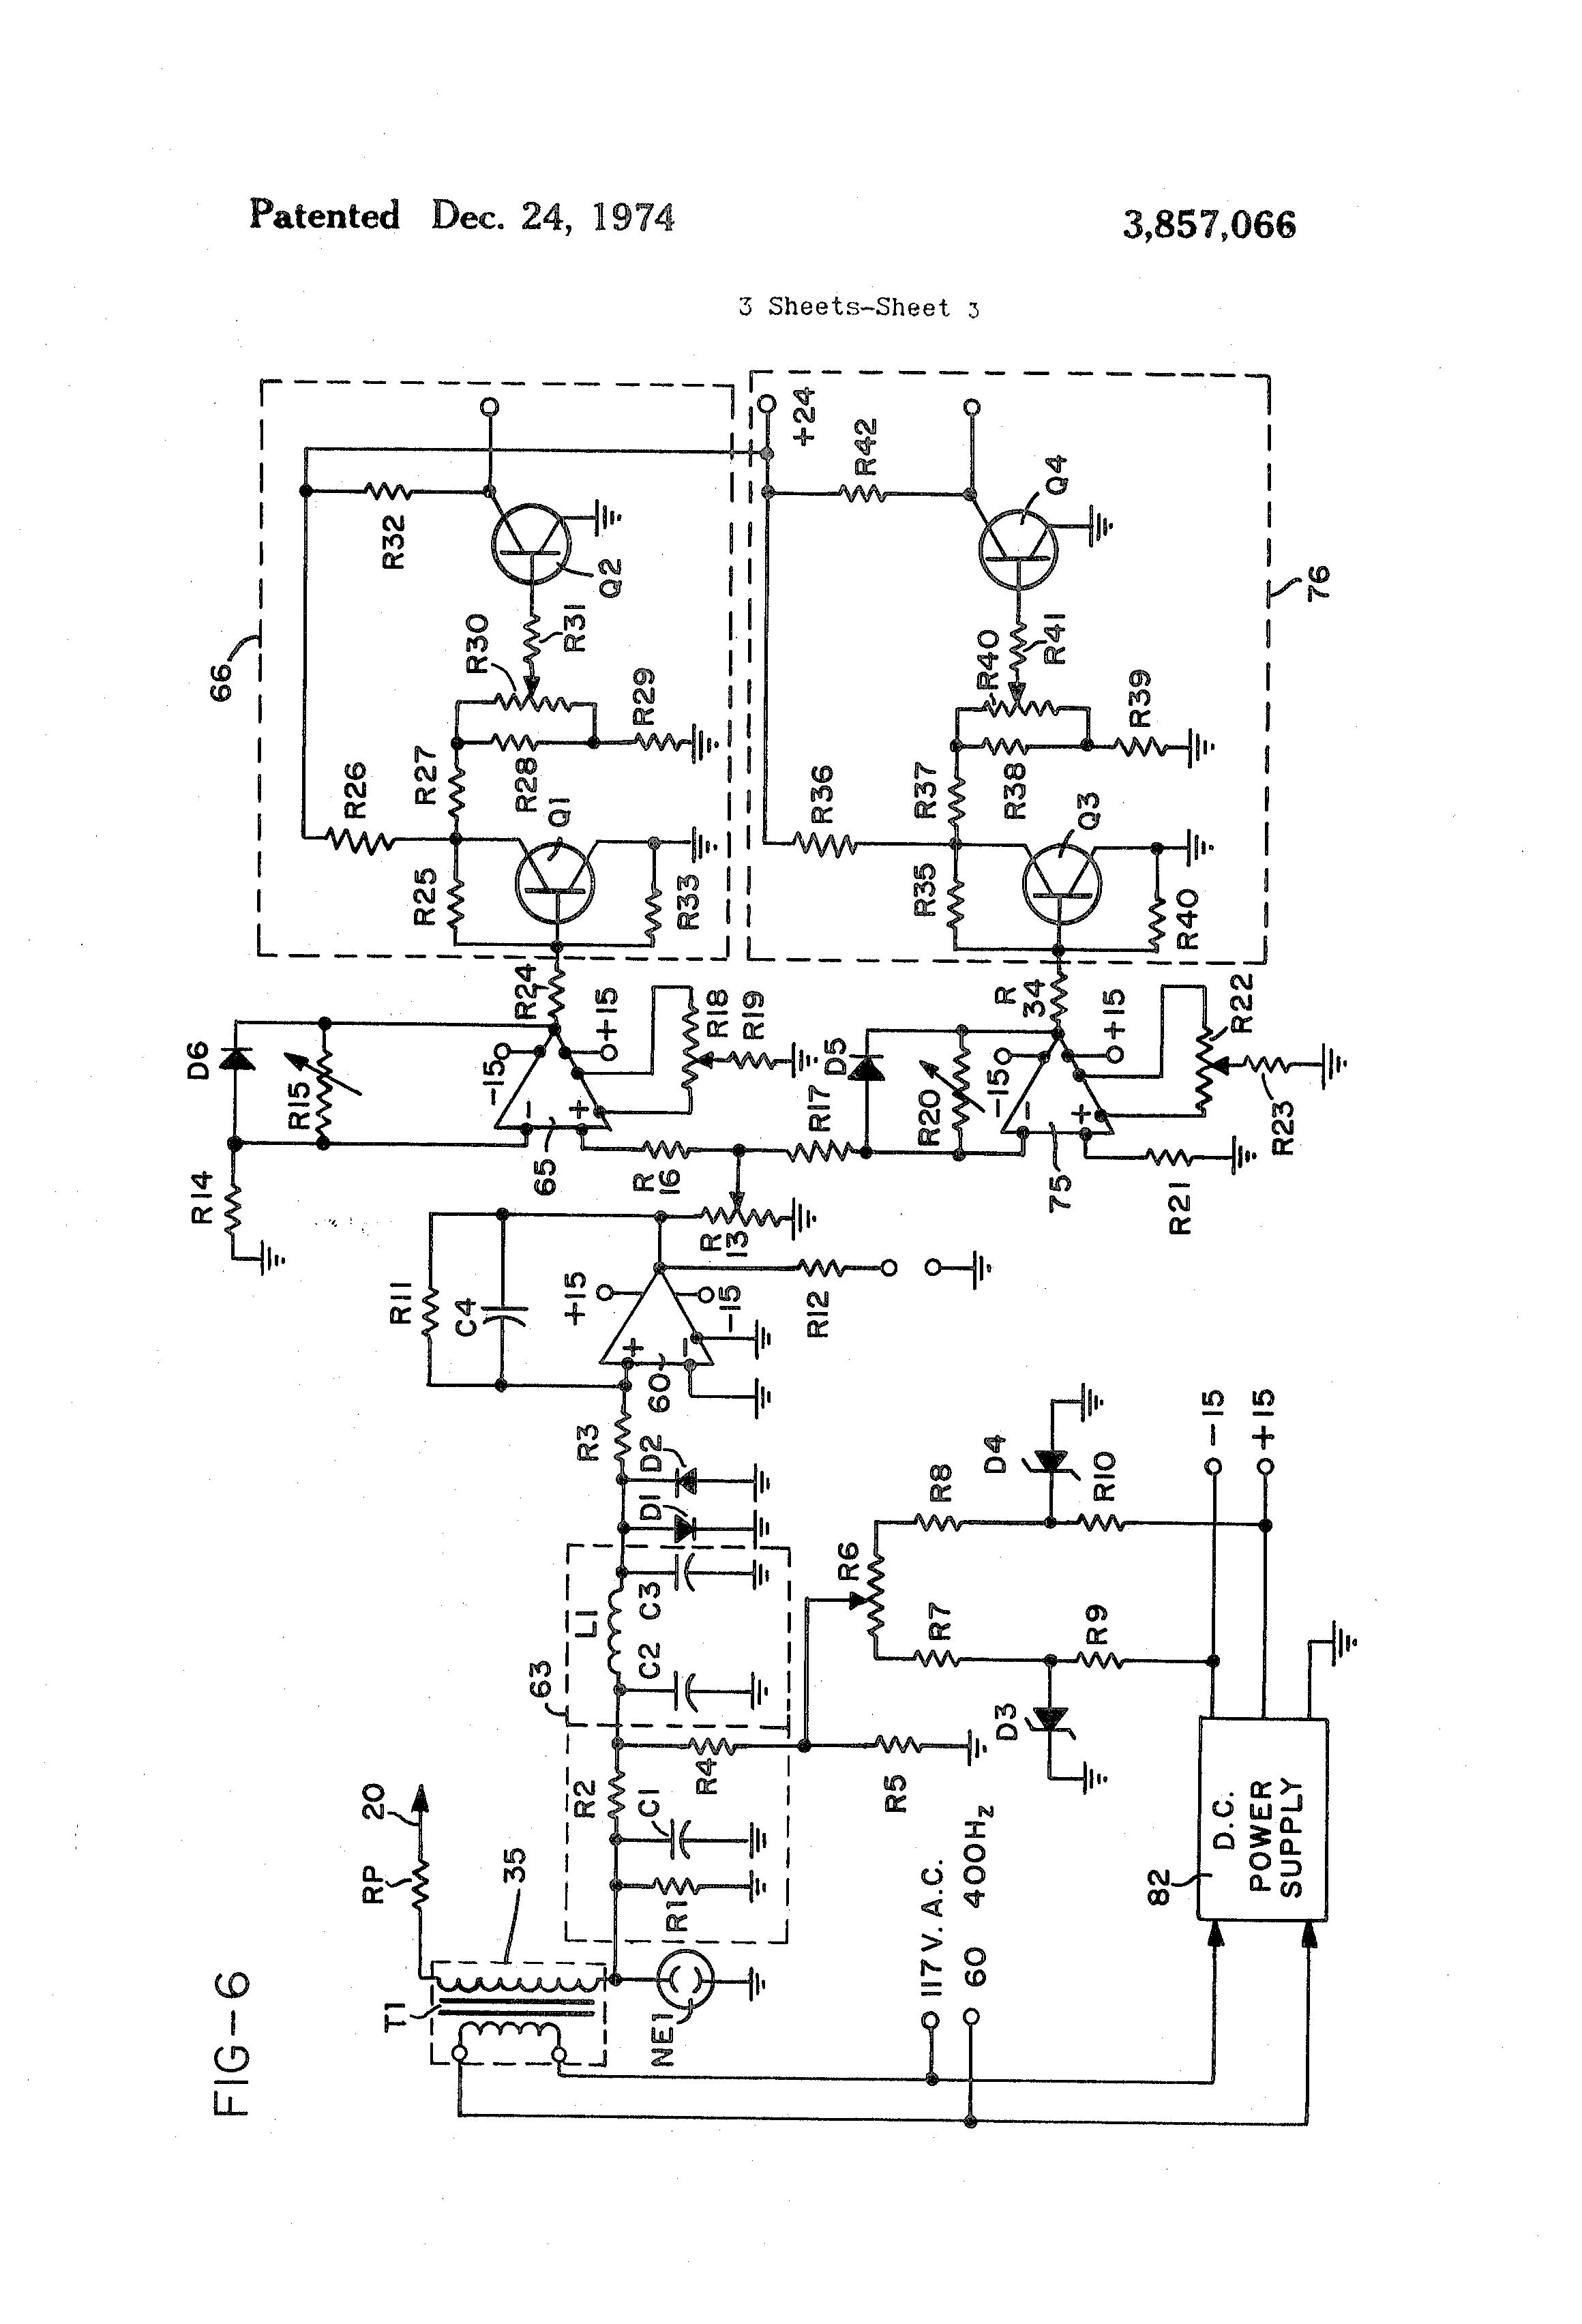 t1 66 block wiring diagram wiring diagram database Loopback Plug Wiring patent us3857066 electrostatic charge sensing probe patents 66 block punch tool t1 66 block wiring diagram